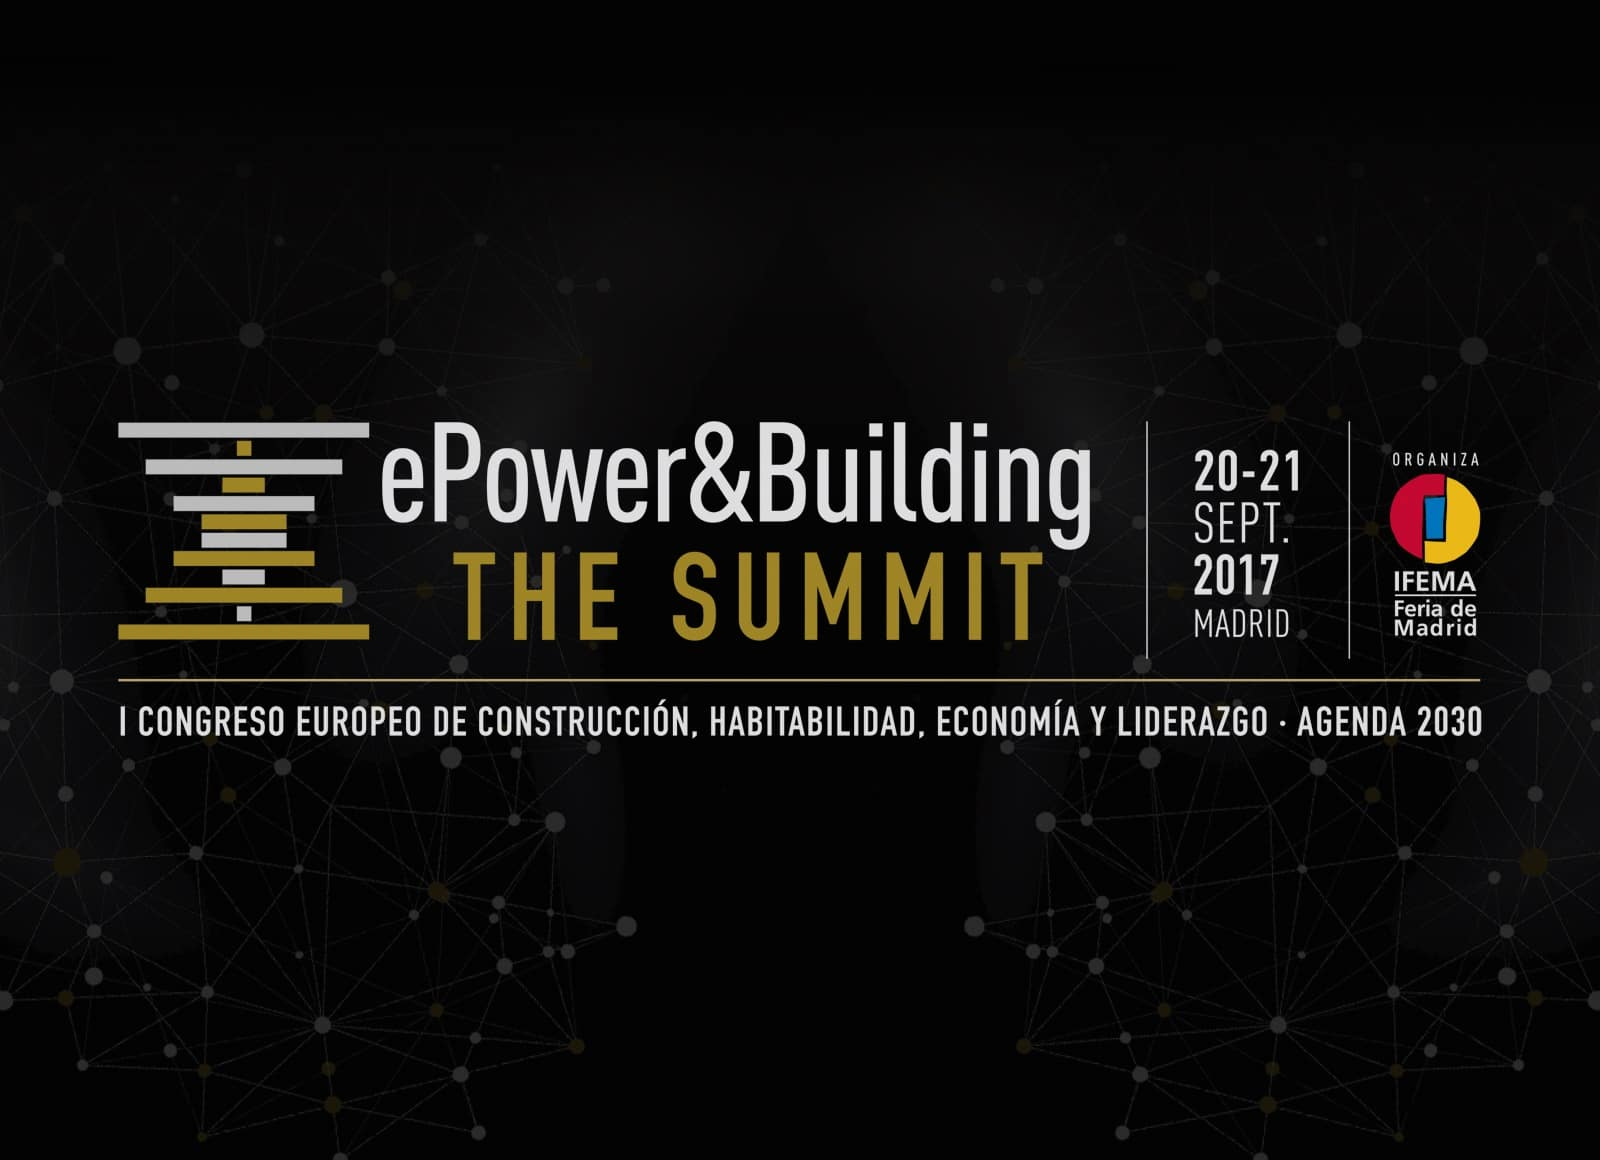 epower building ifema